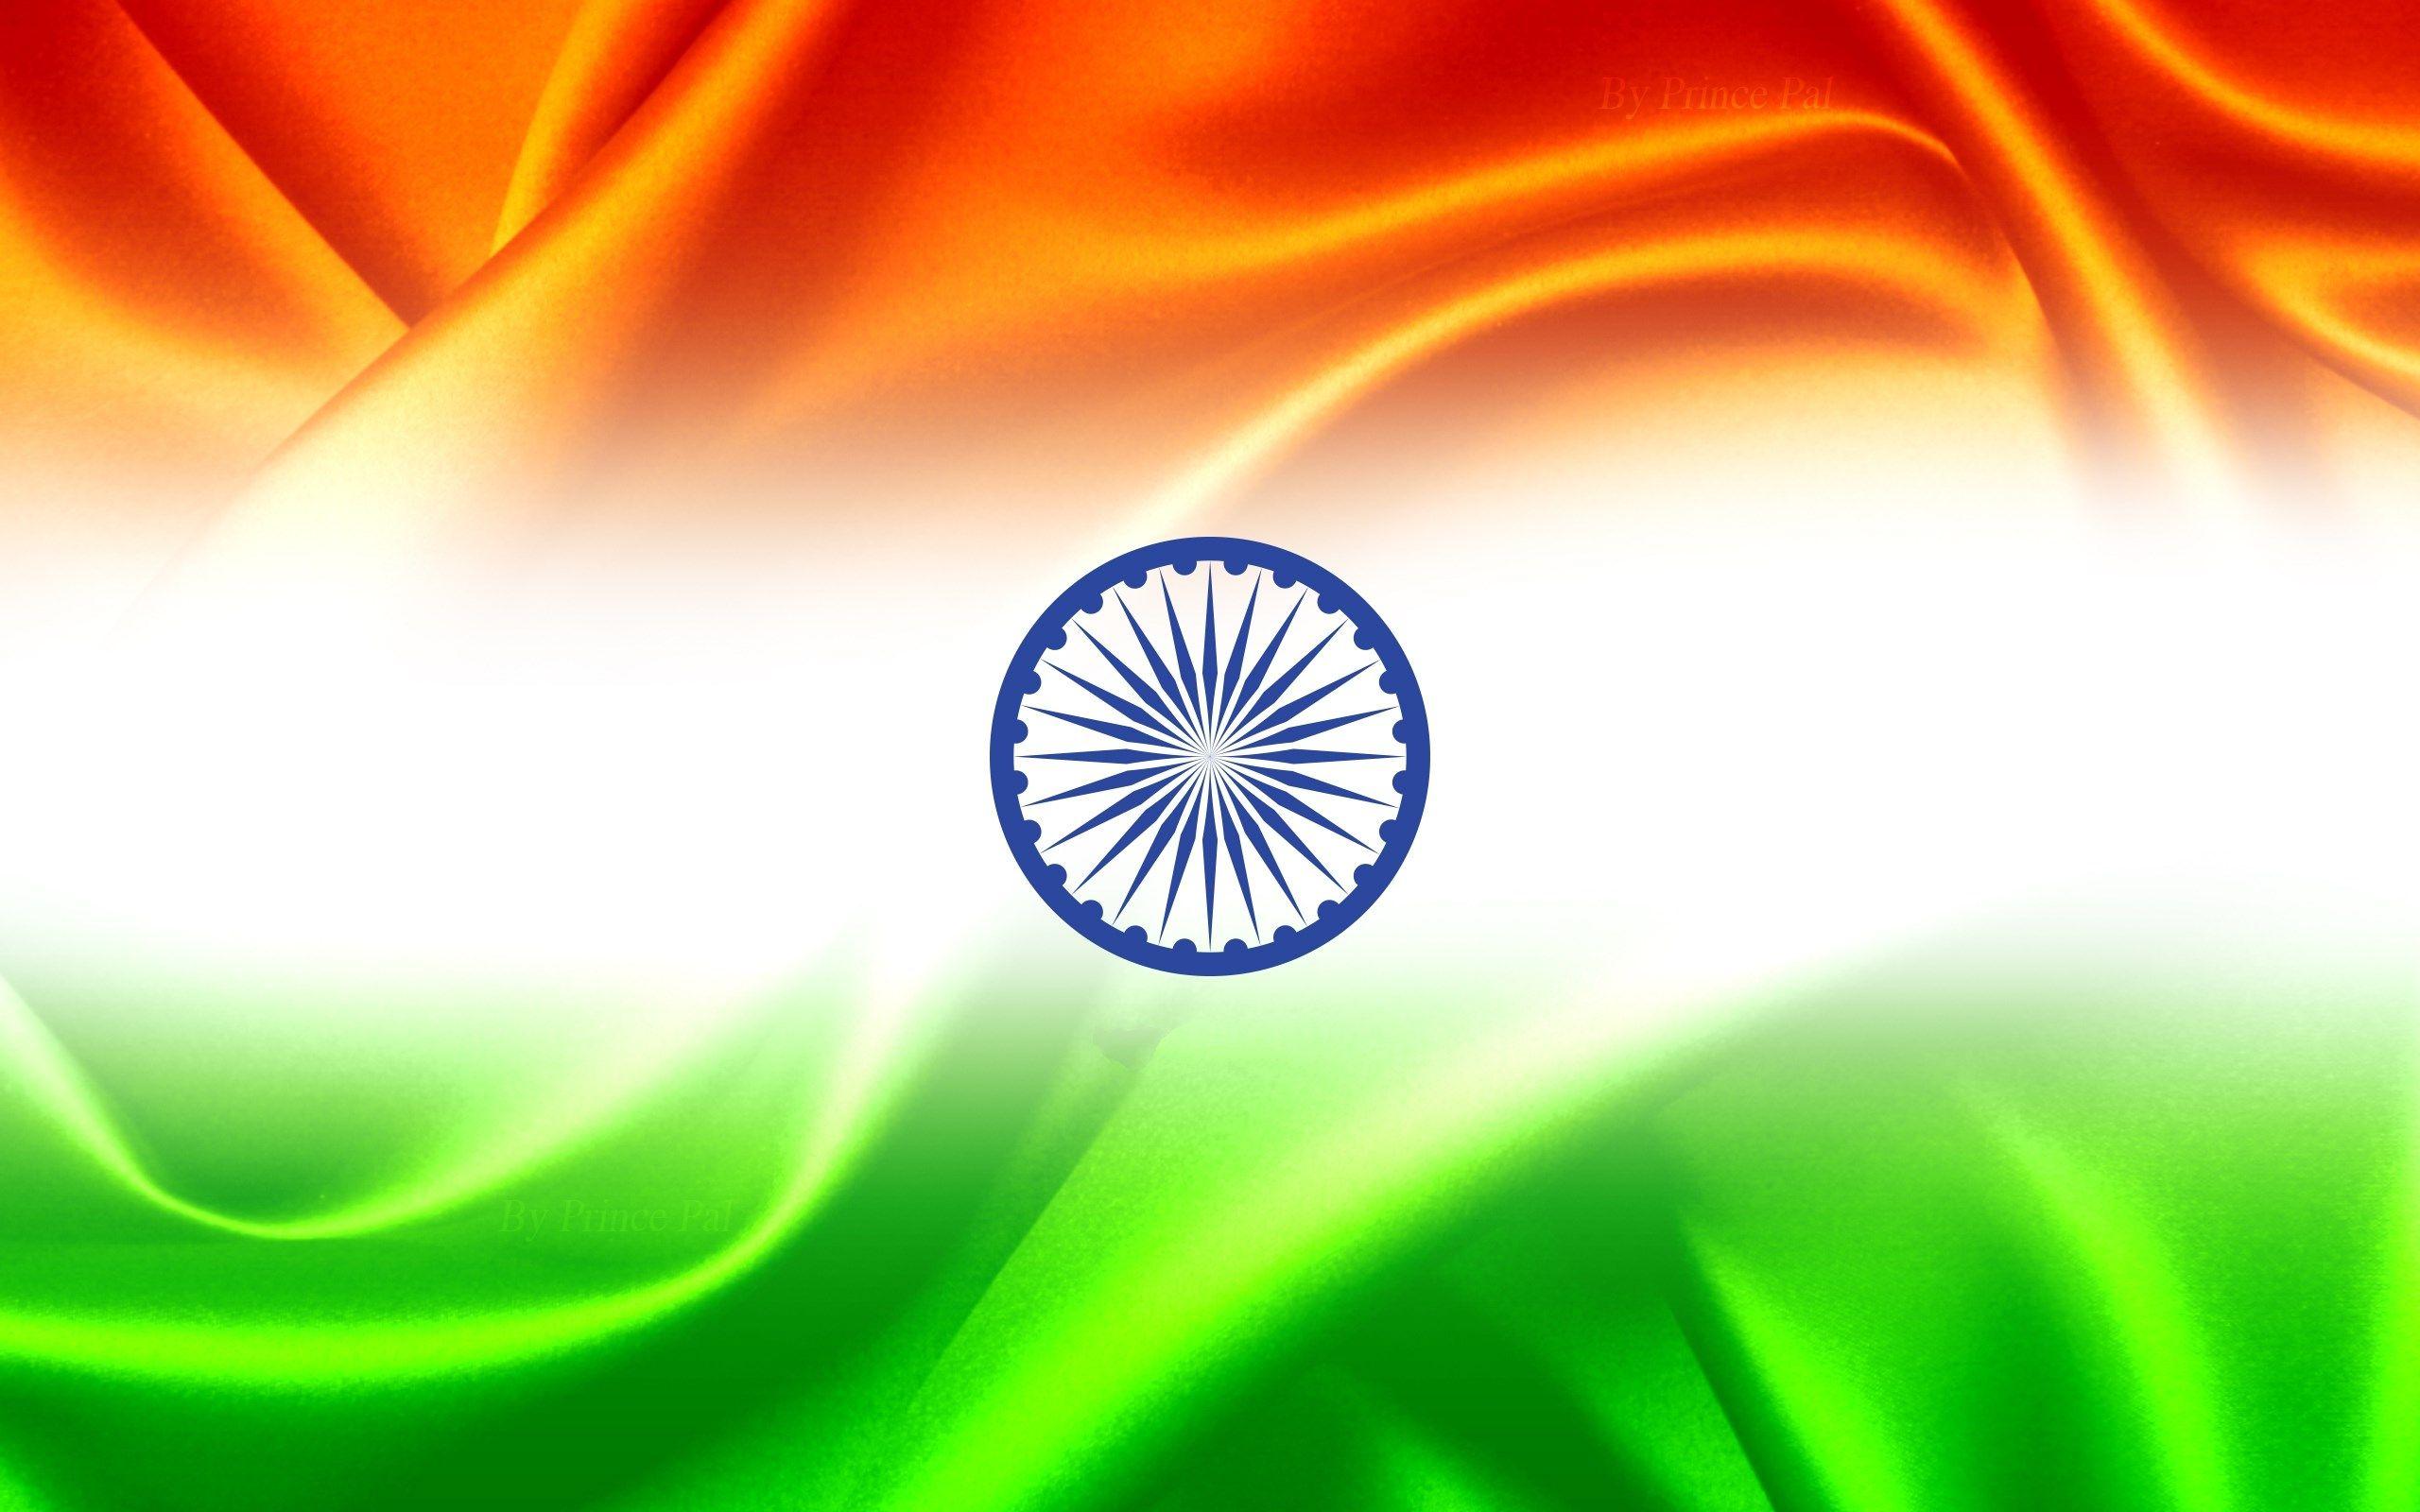 Hd Indian Flag Wallpaper